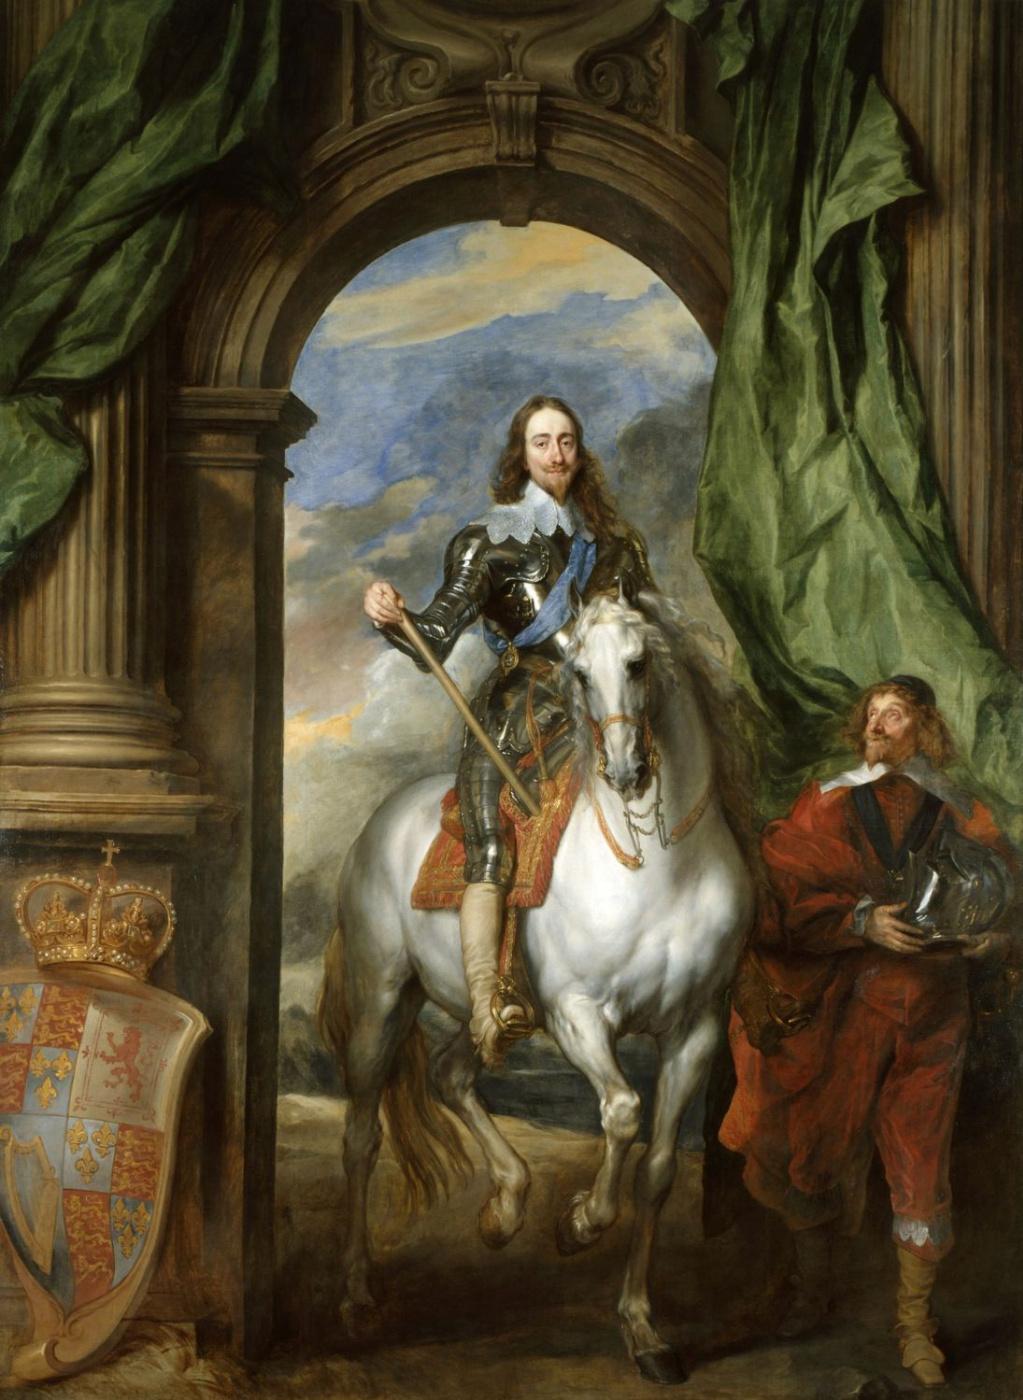 Anthony van Dyck. Charles I and the Senor de Saint-Antoine